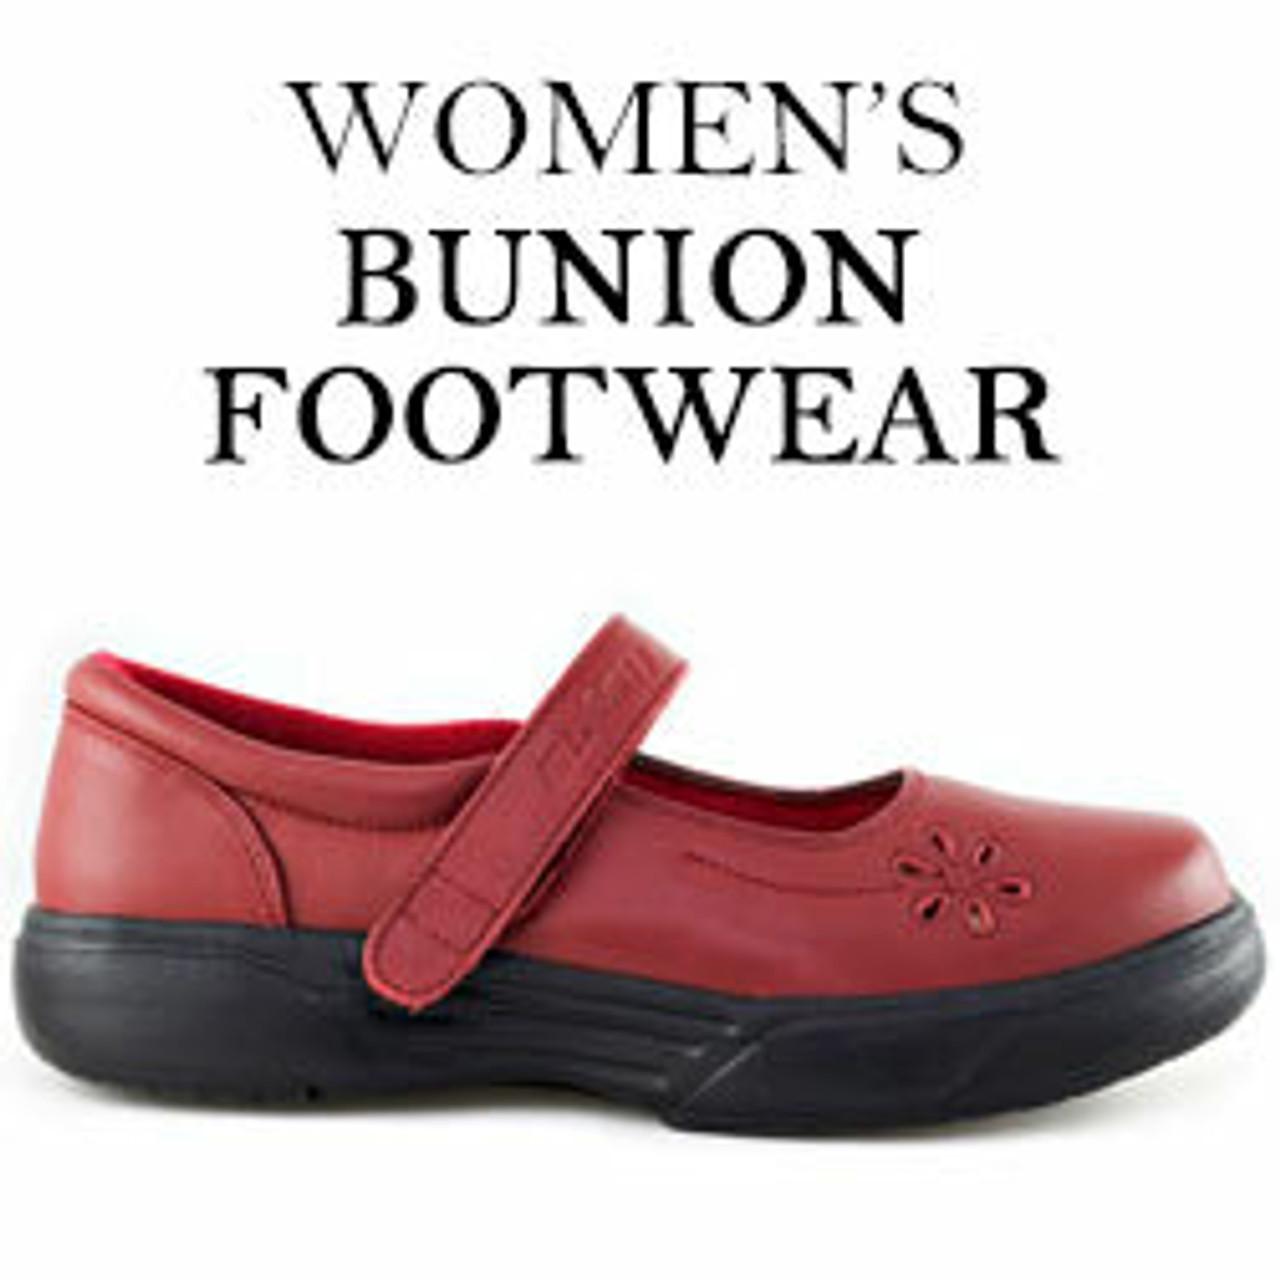 Shoes For Bunions | Bunion Sandals | Bunion Shoes